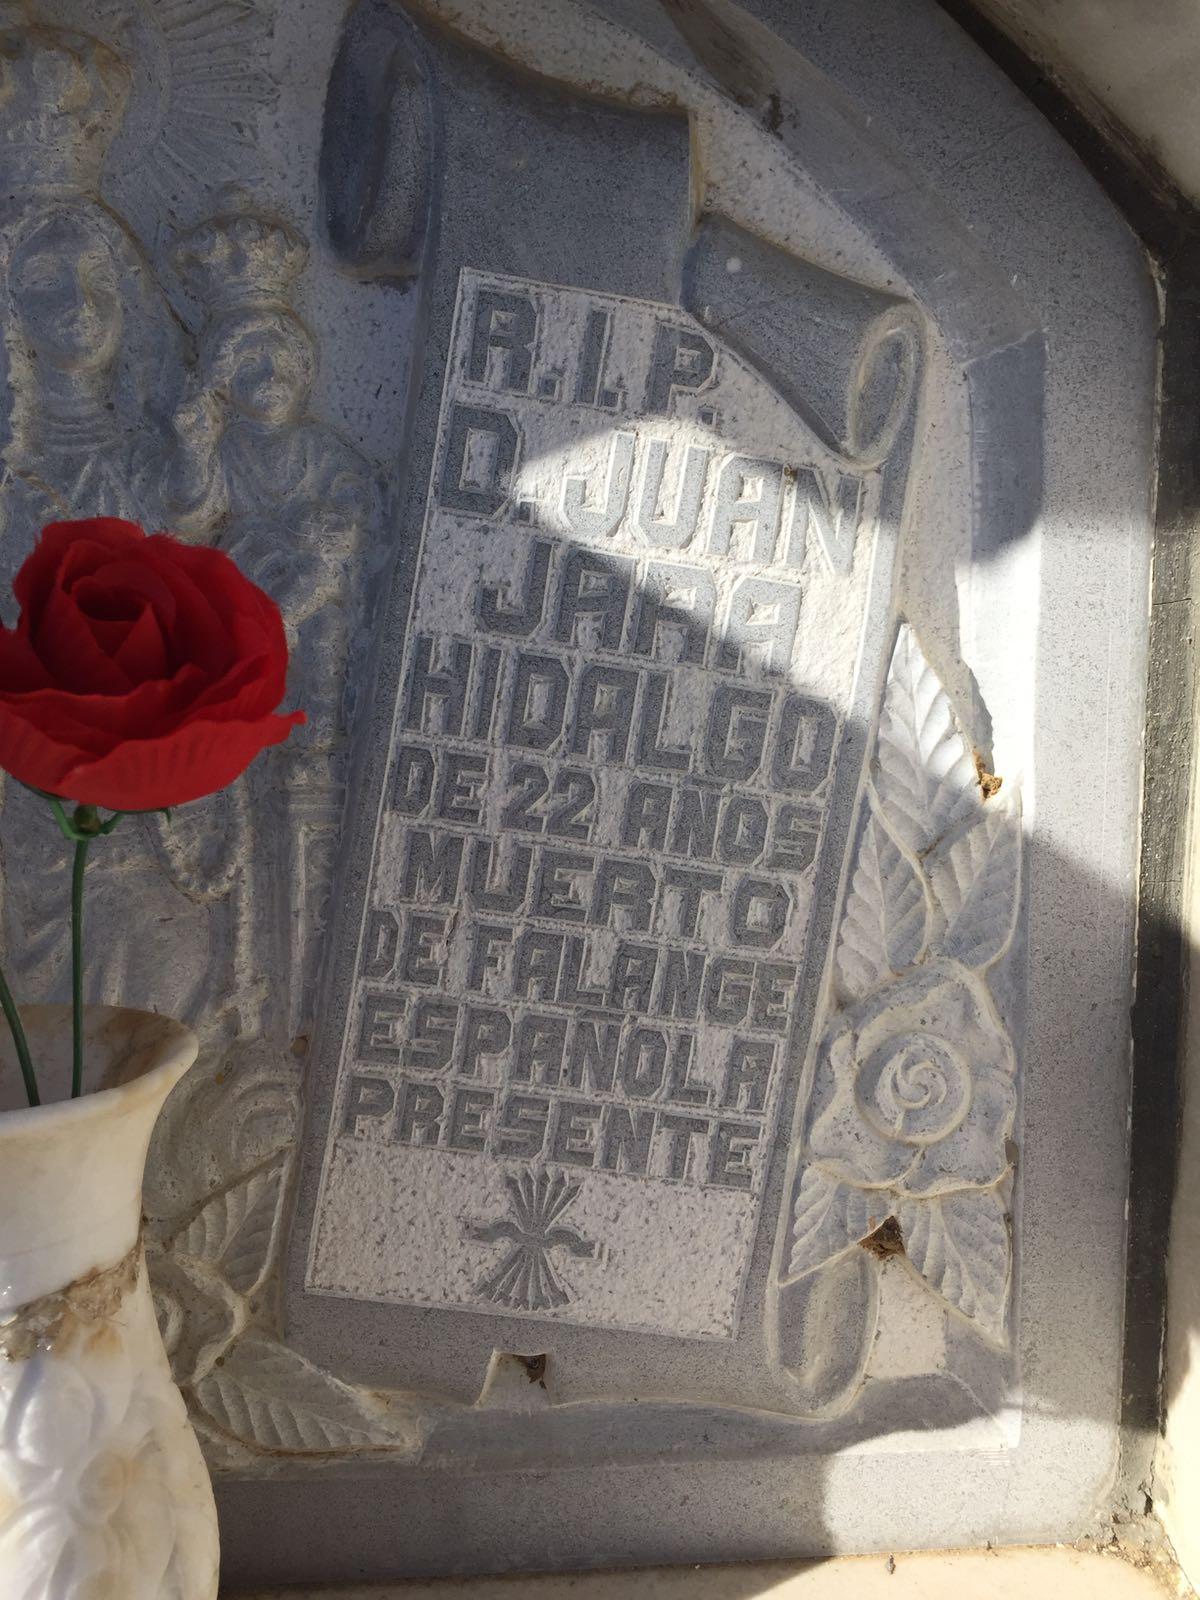 Visita histórica a La Falange de Don Benito.